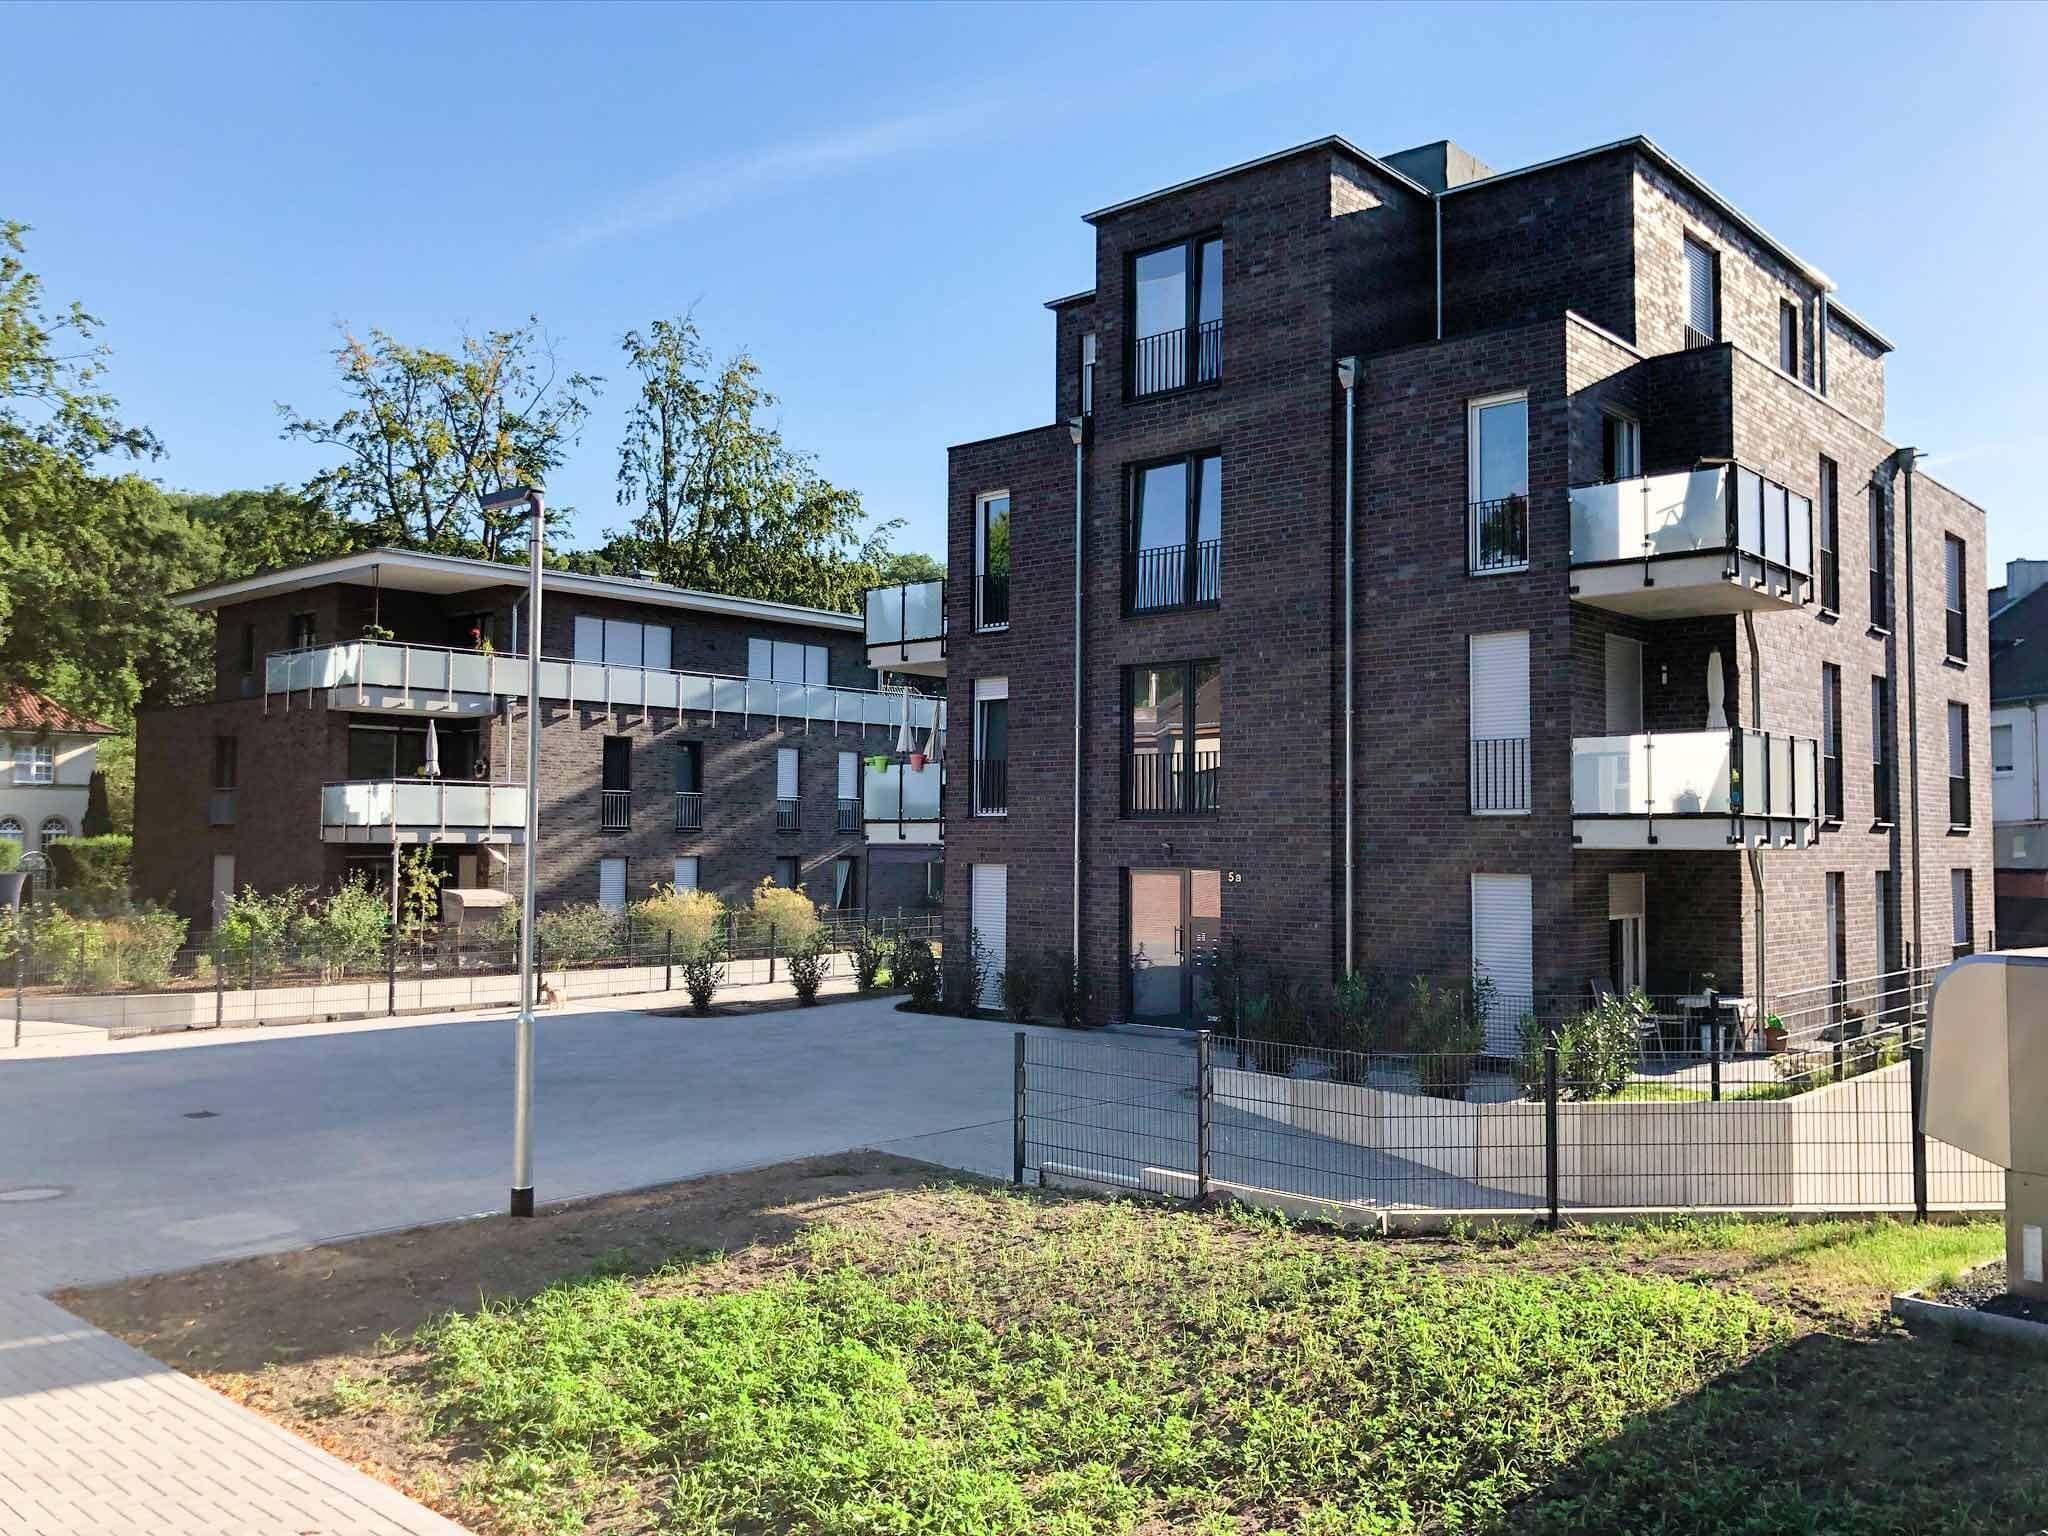 TRAPP_Real-Estate_Projekte_Lipperheystr-02 (1)